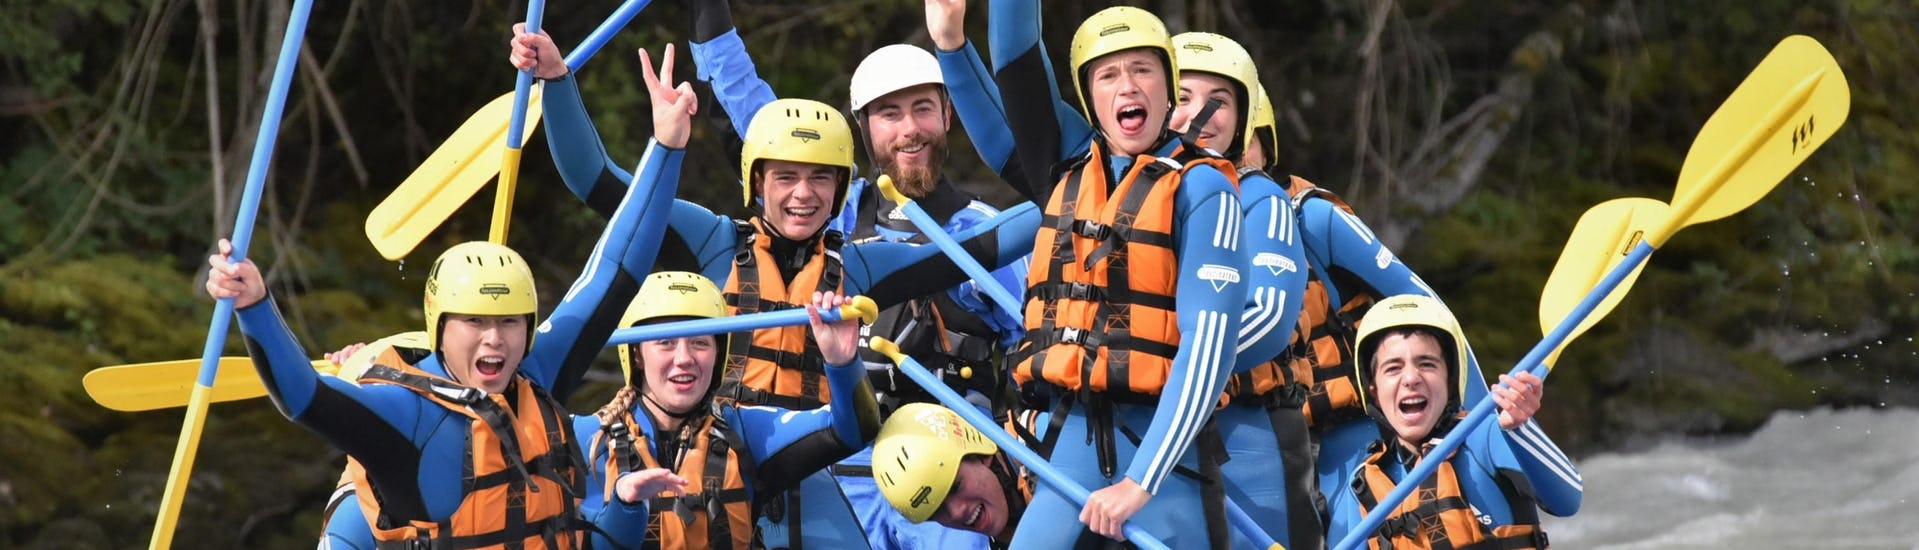 rafting-for-families---imster-schlucht-faszinatour-hero